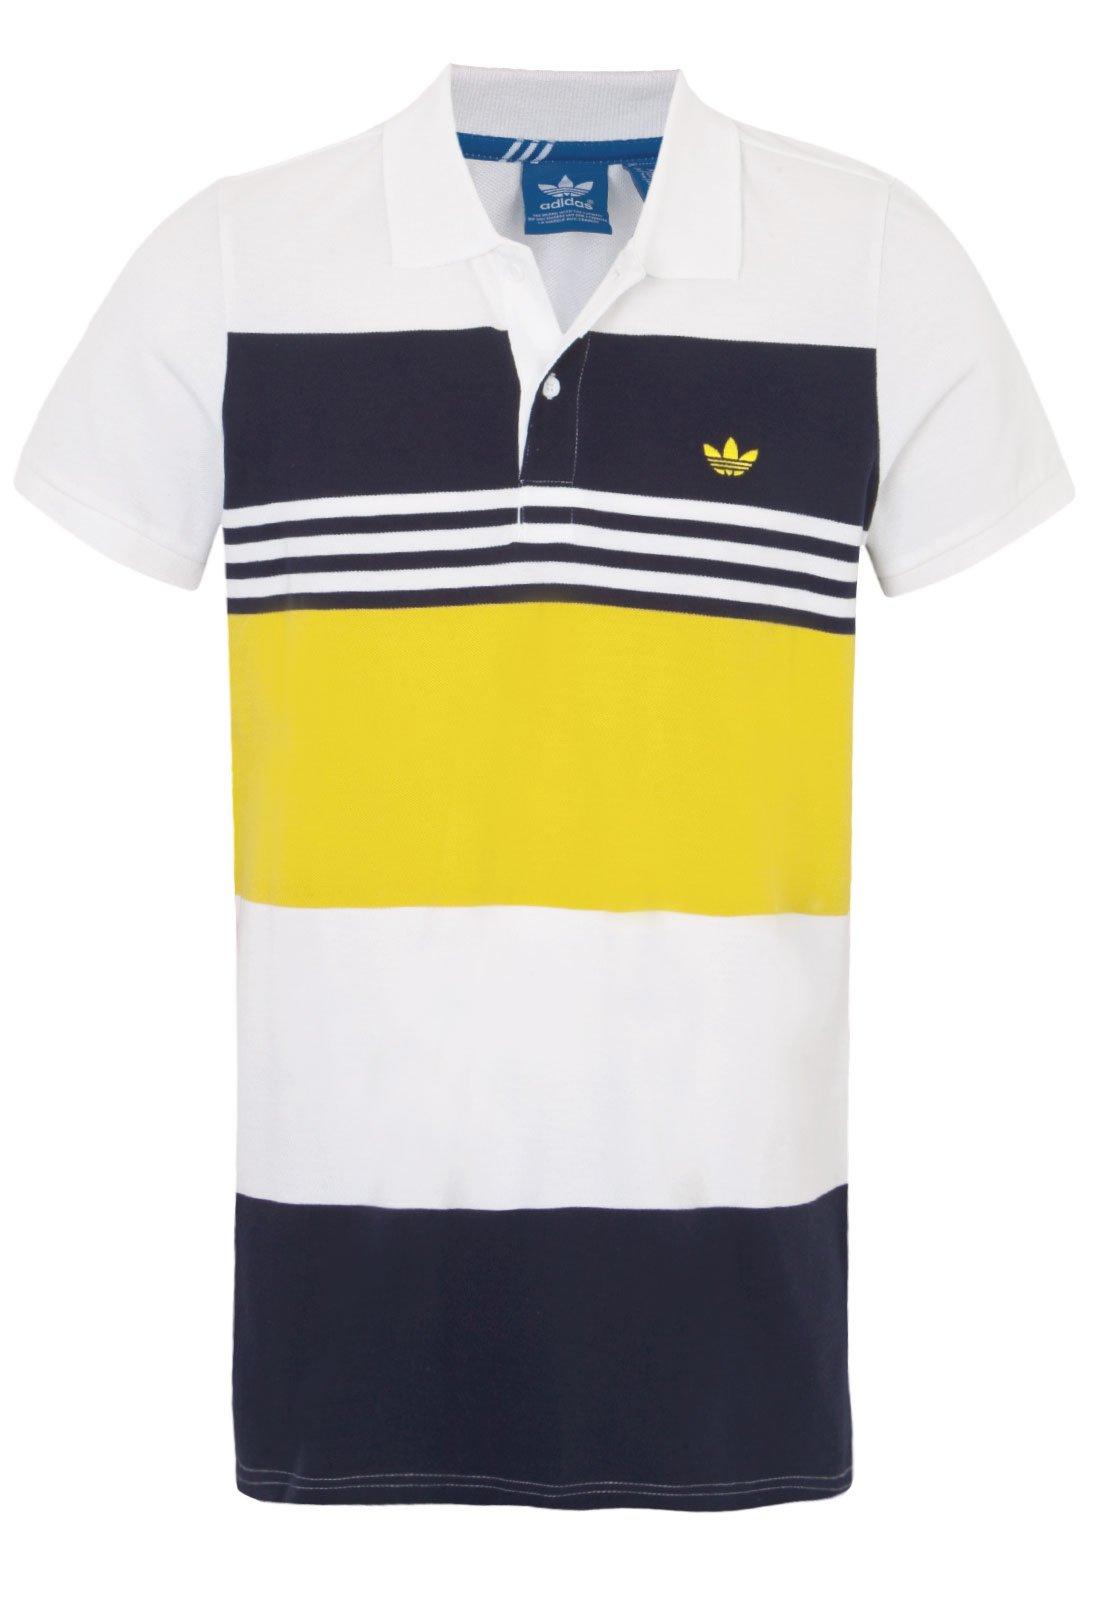 camisetas adidas em promocao dd625c243a403